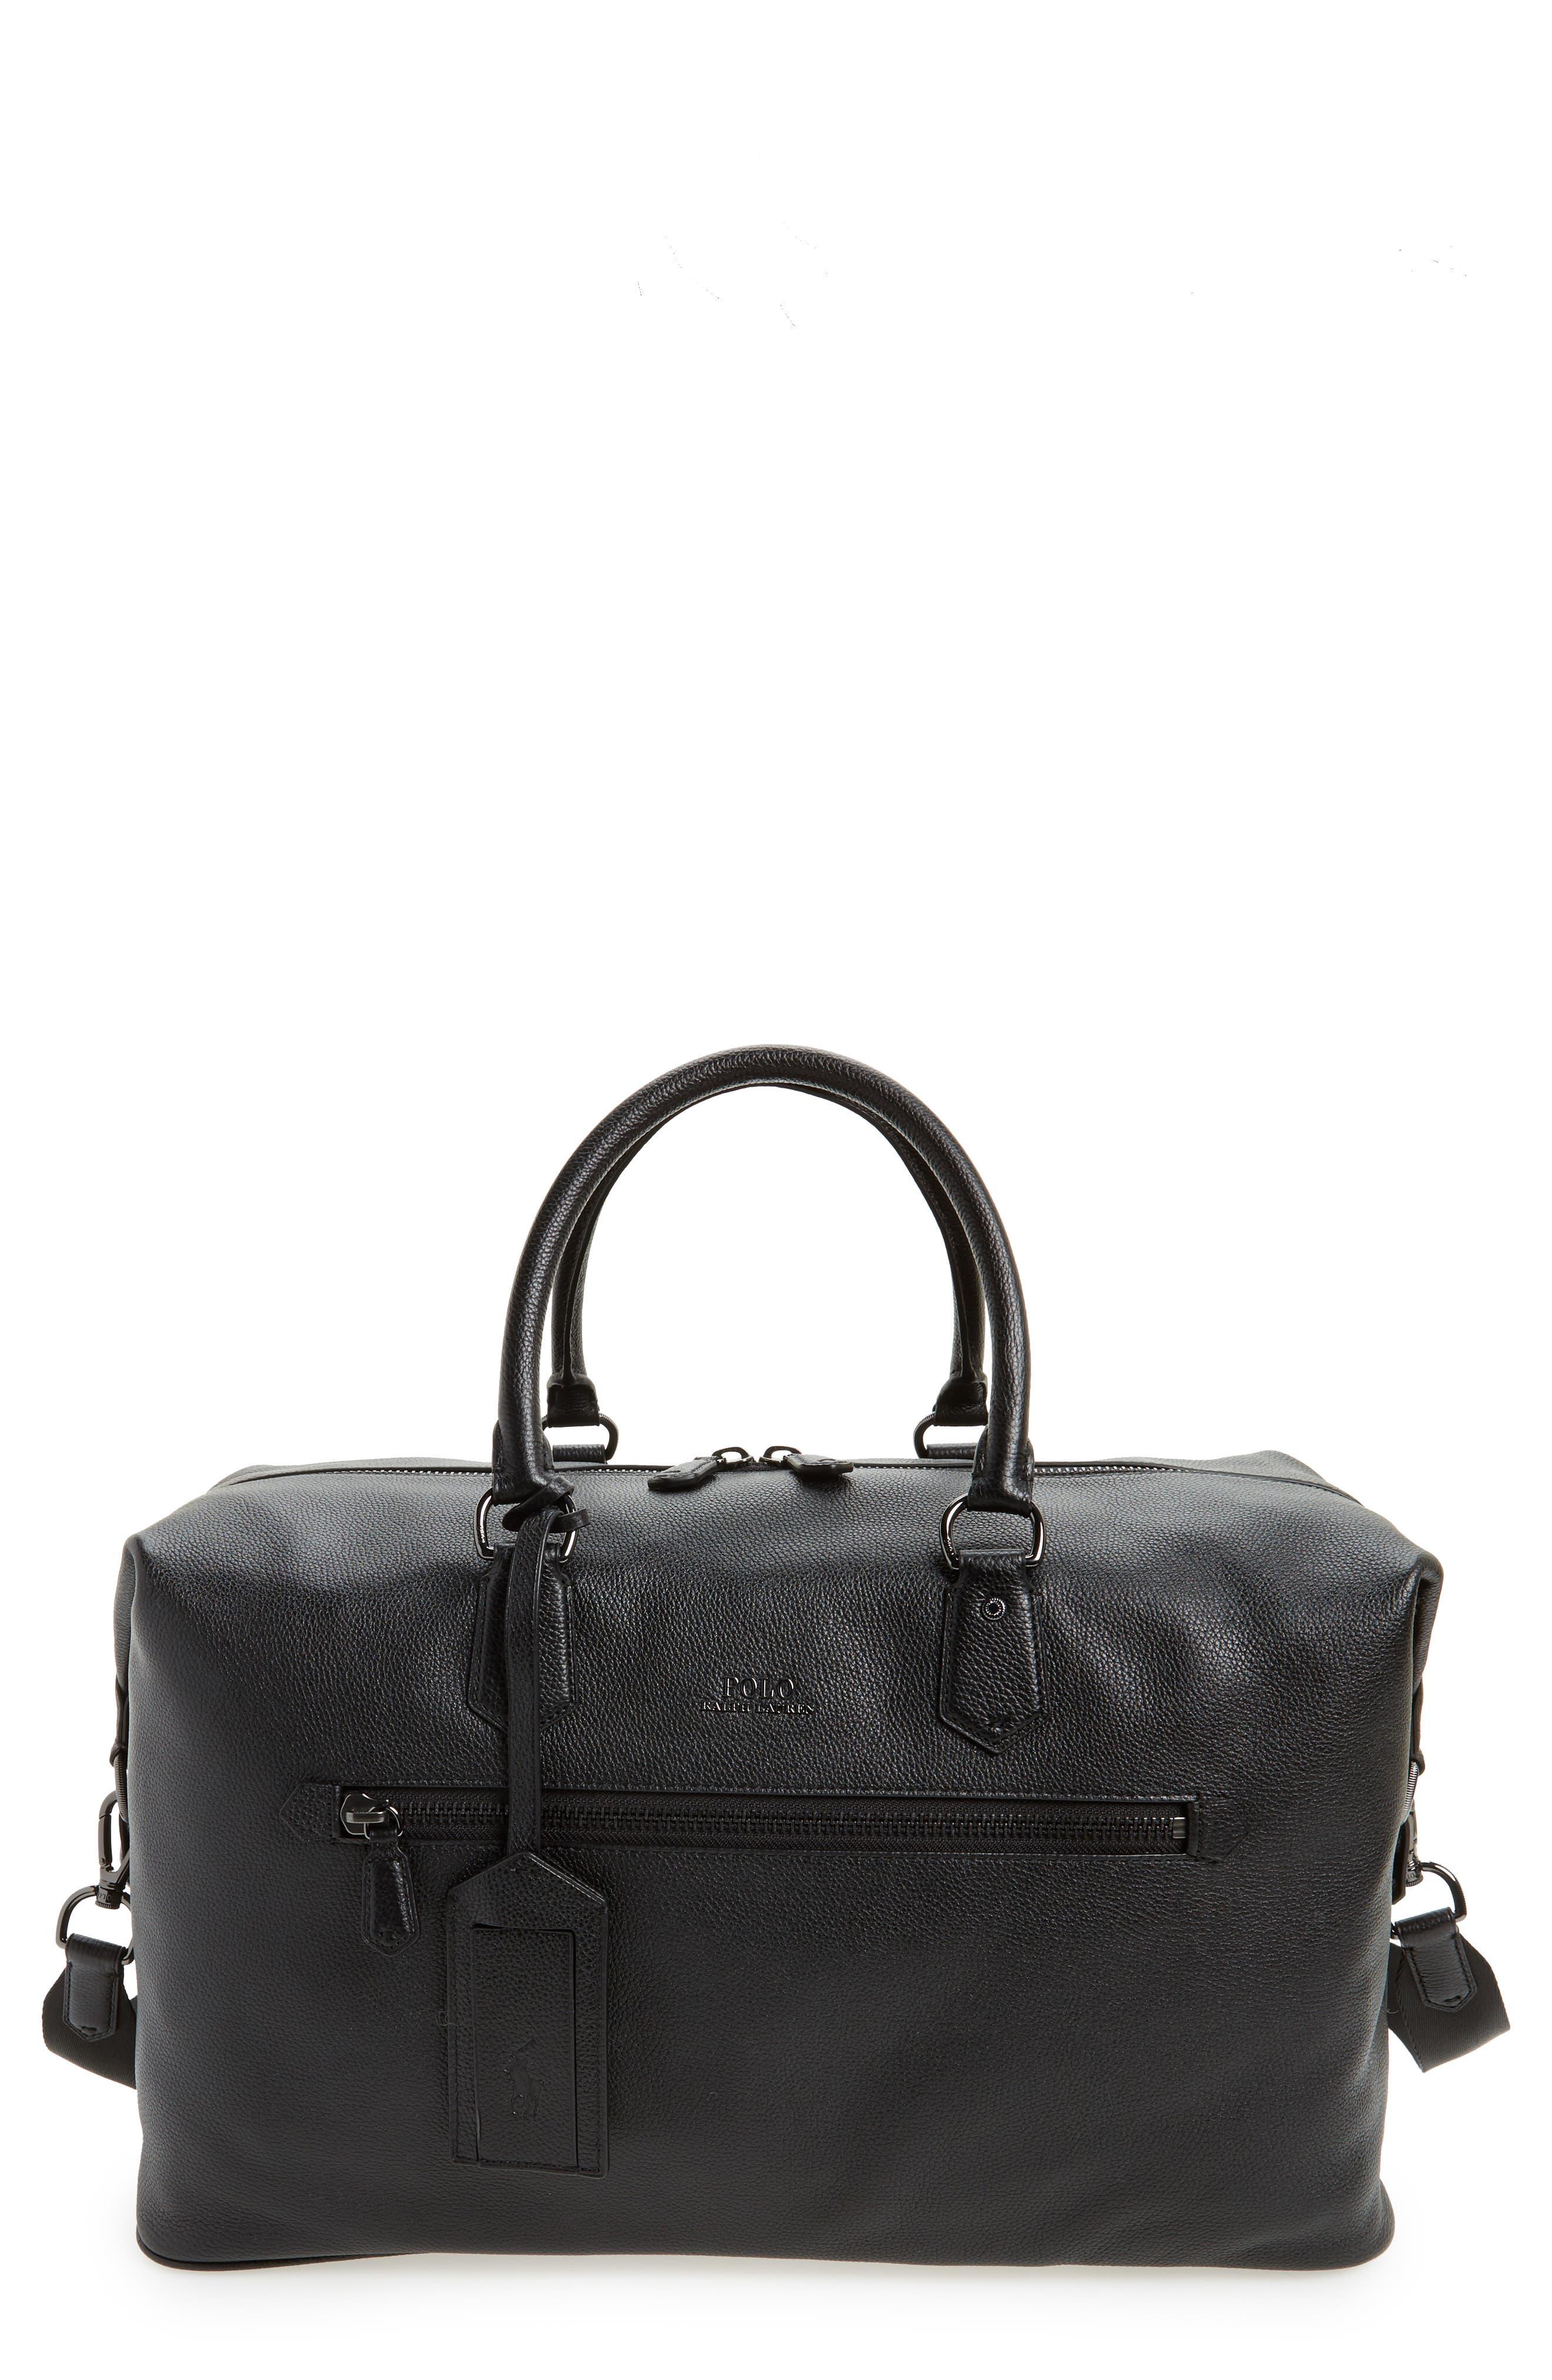 Alternate Image 1 Selected - Polo Ralph Lauren Pebbled Leather Duffel Bag